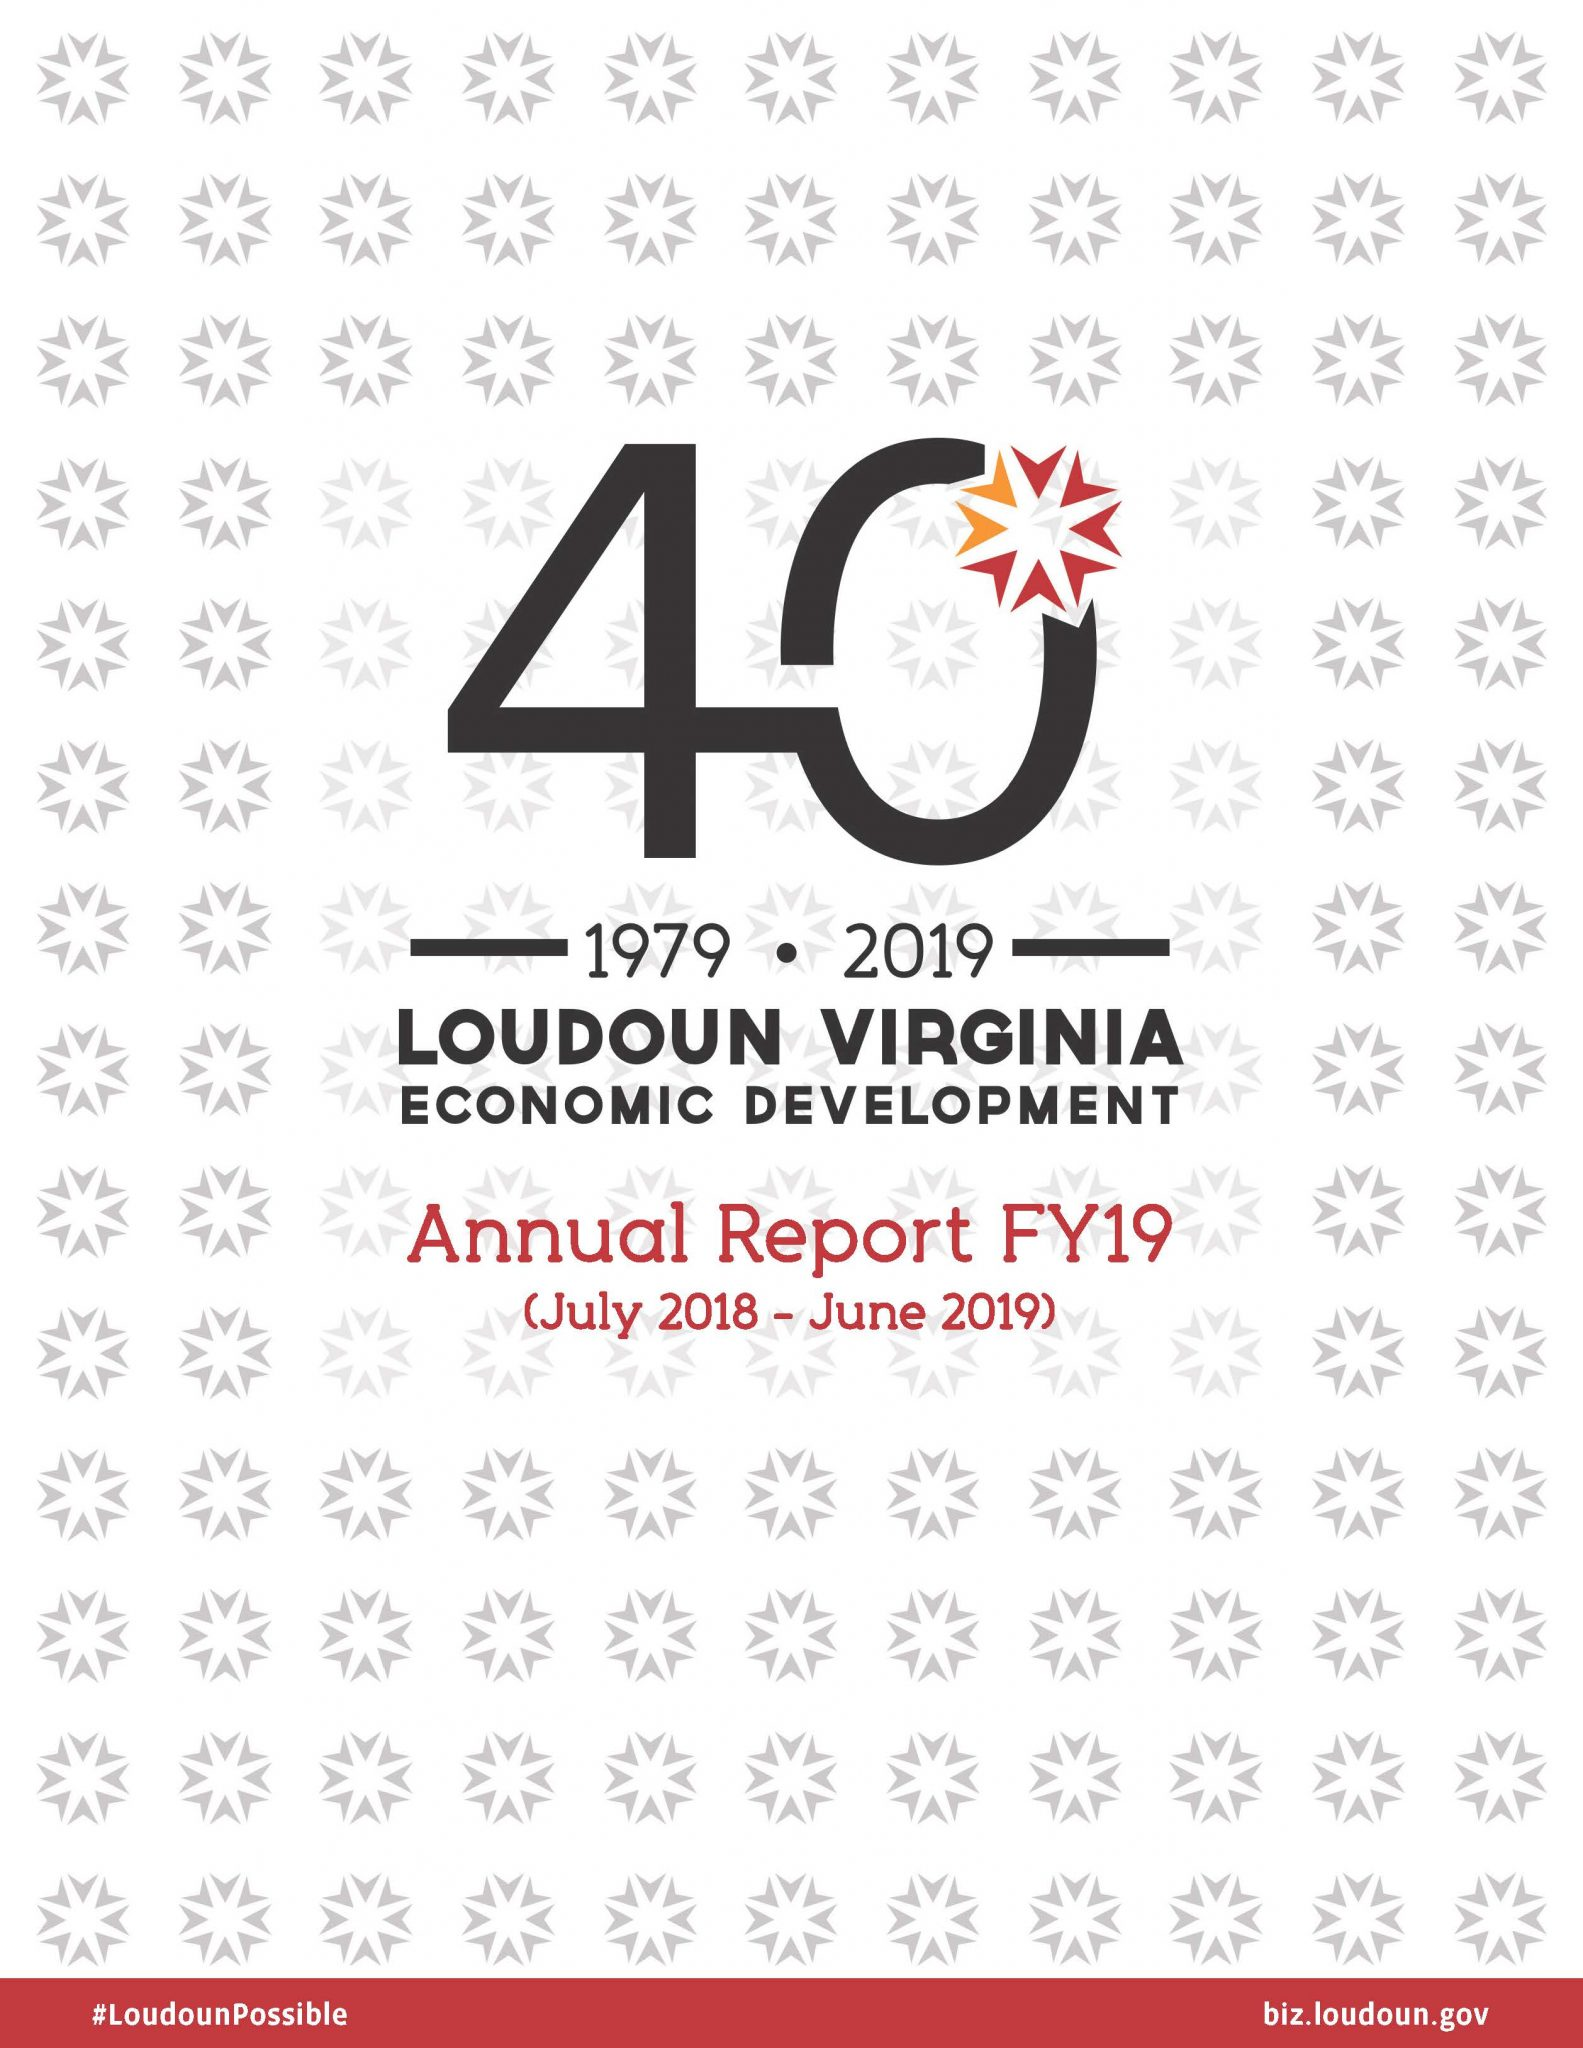 FY 2019 Loudoun Economic Development Annual Report Cover